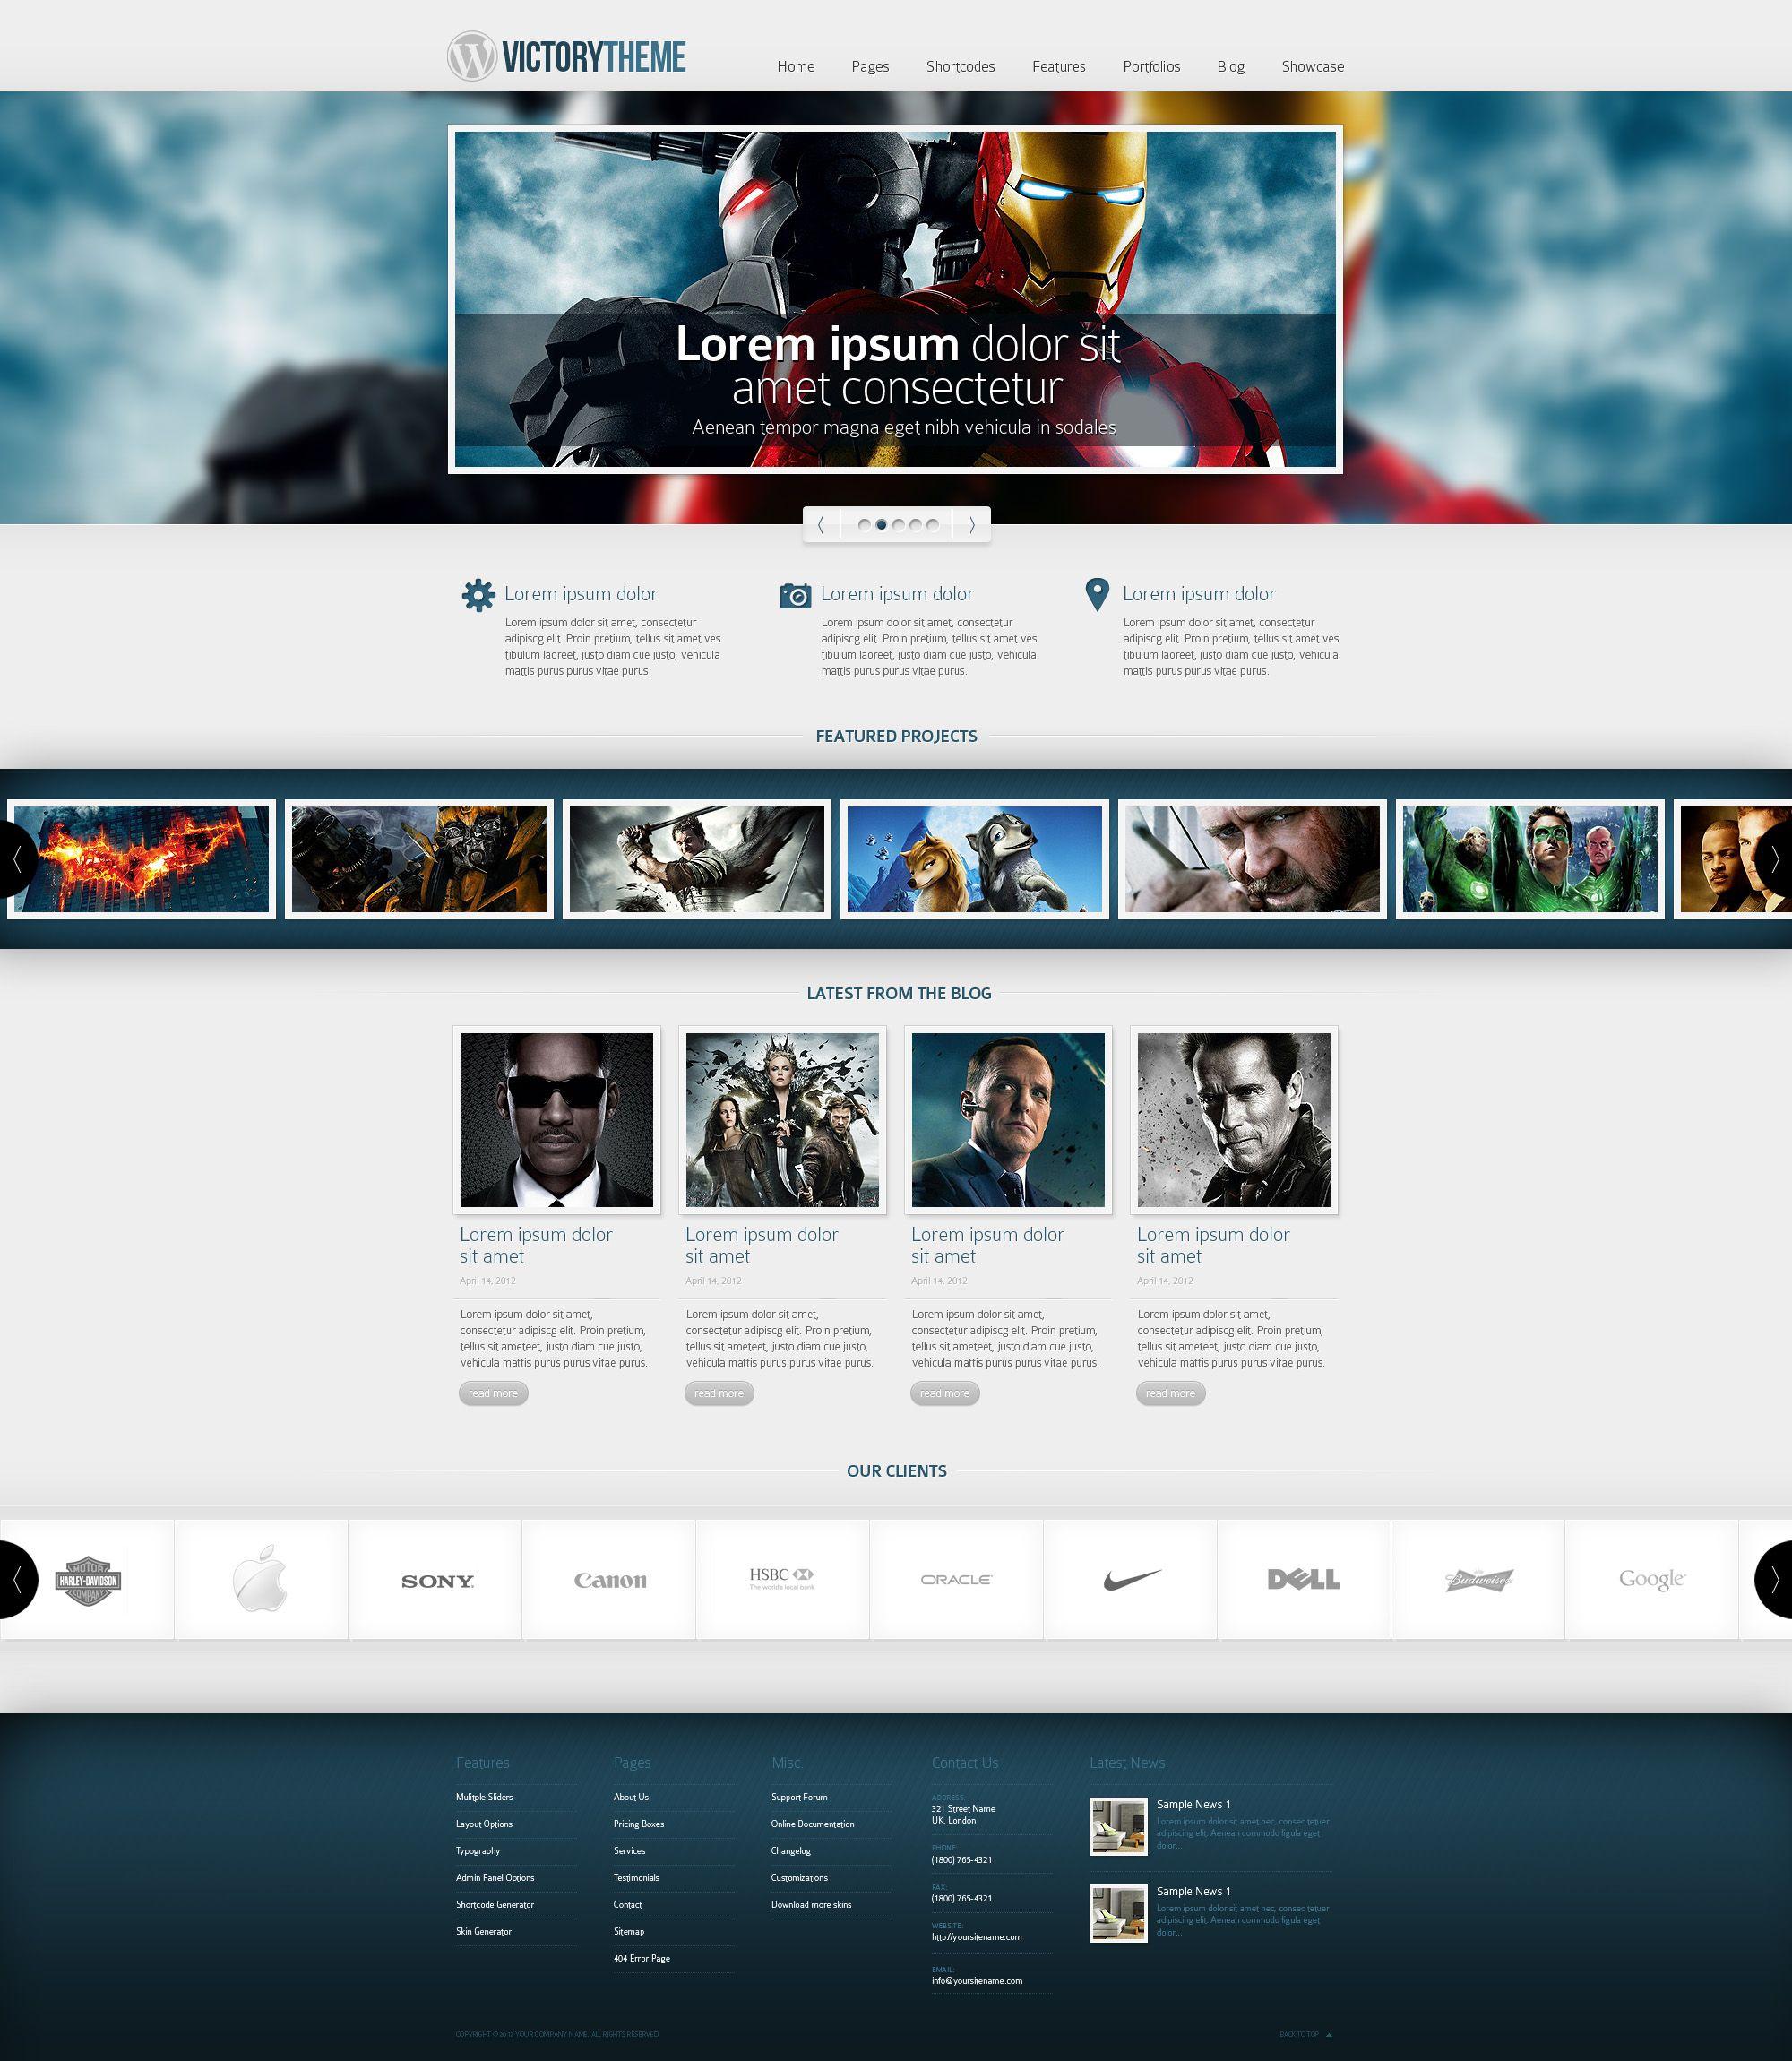 Web Design Wordpress Template By Victorydesign On Deviantart Web Design Web Design Trends Wordpress Template